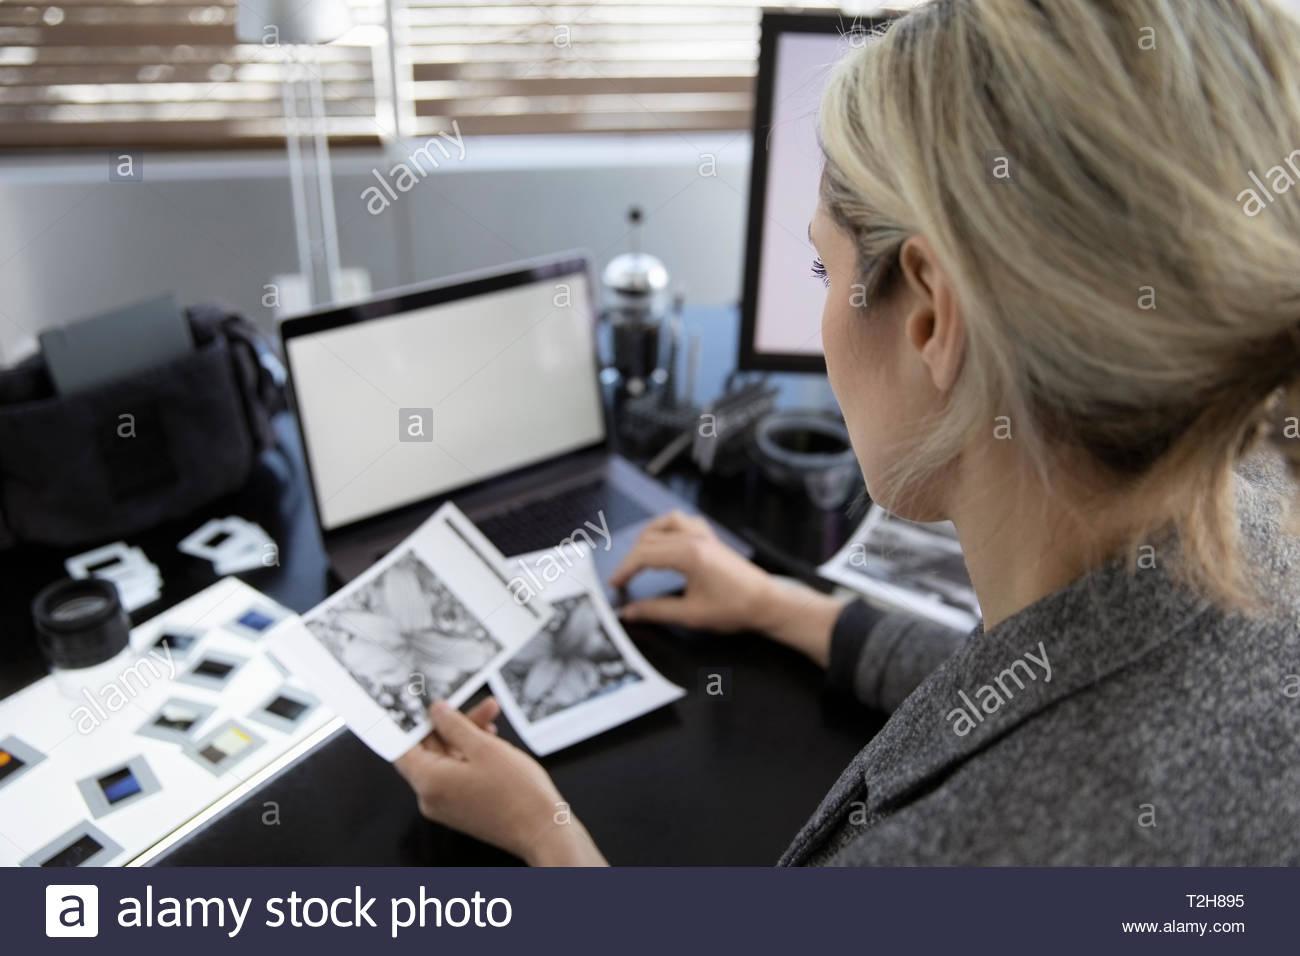 Fotografin überprüfung Negative in Office Stockbild